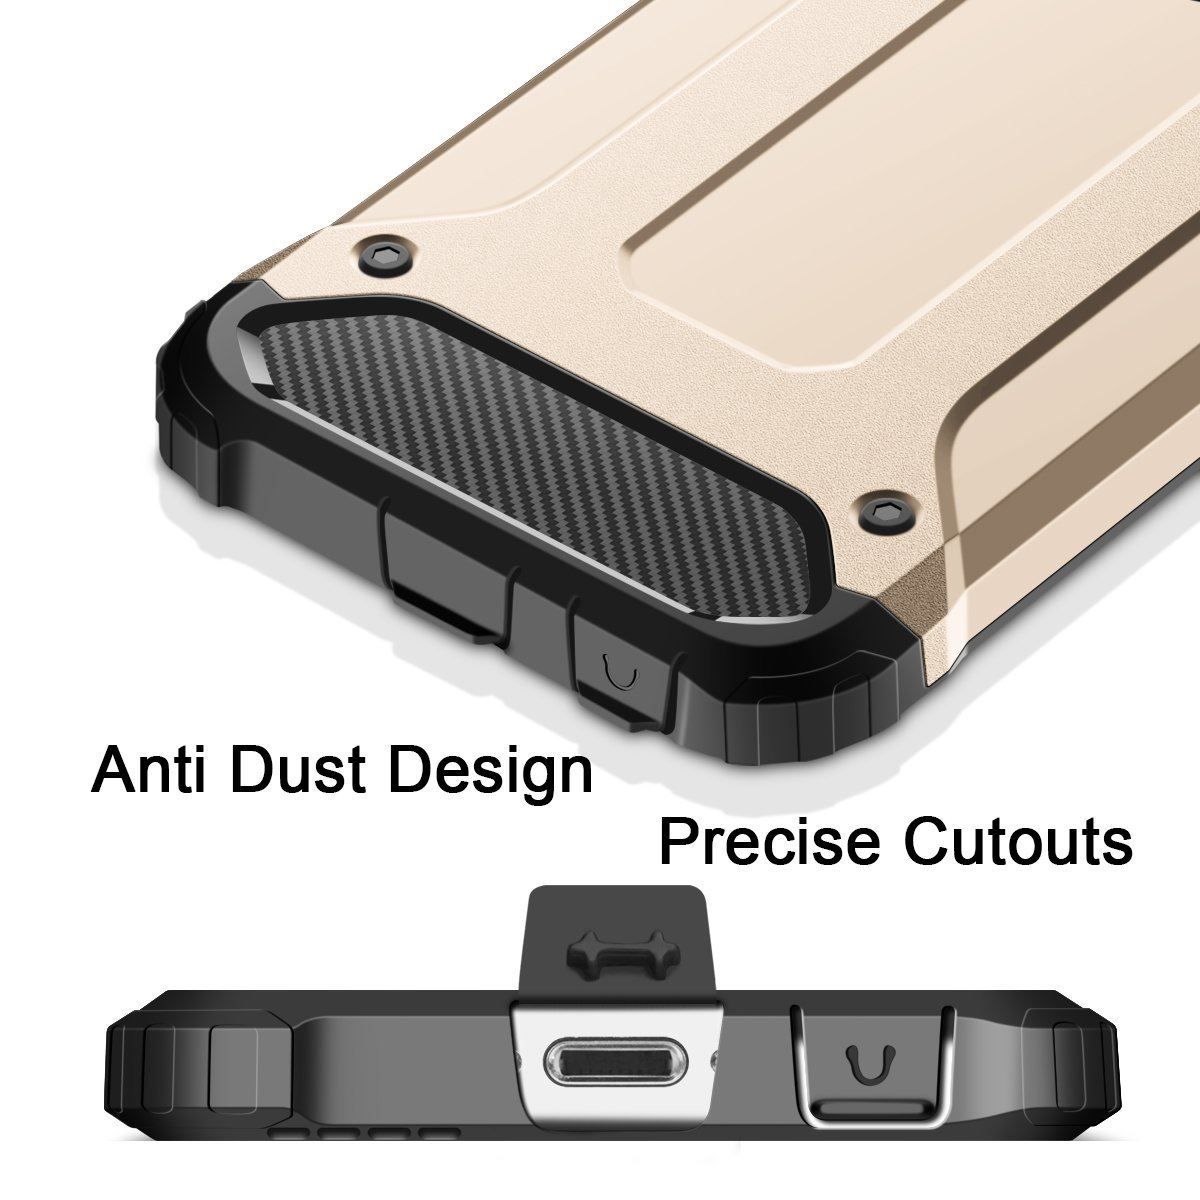 thumbnail 20 - For Apple iPhone 11 Pro Max XR Xs X 8 7 Plus 6 5 Se Case Cover Impact Heavy Duty